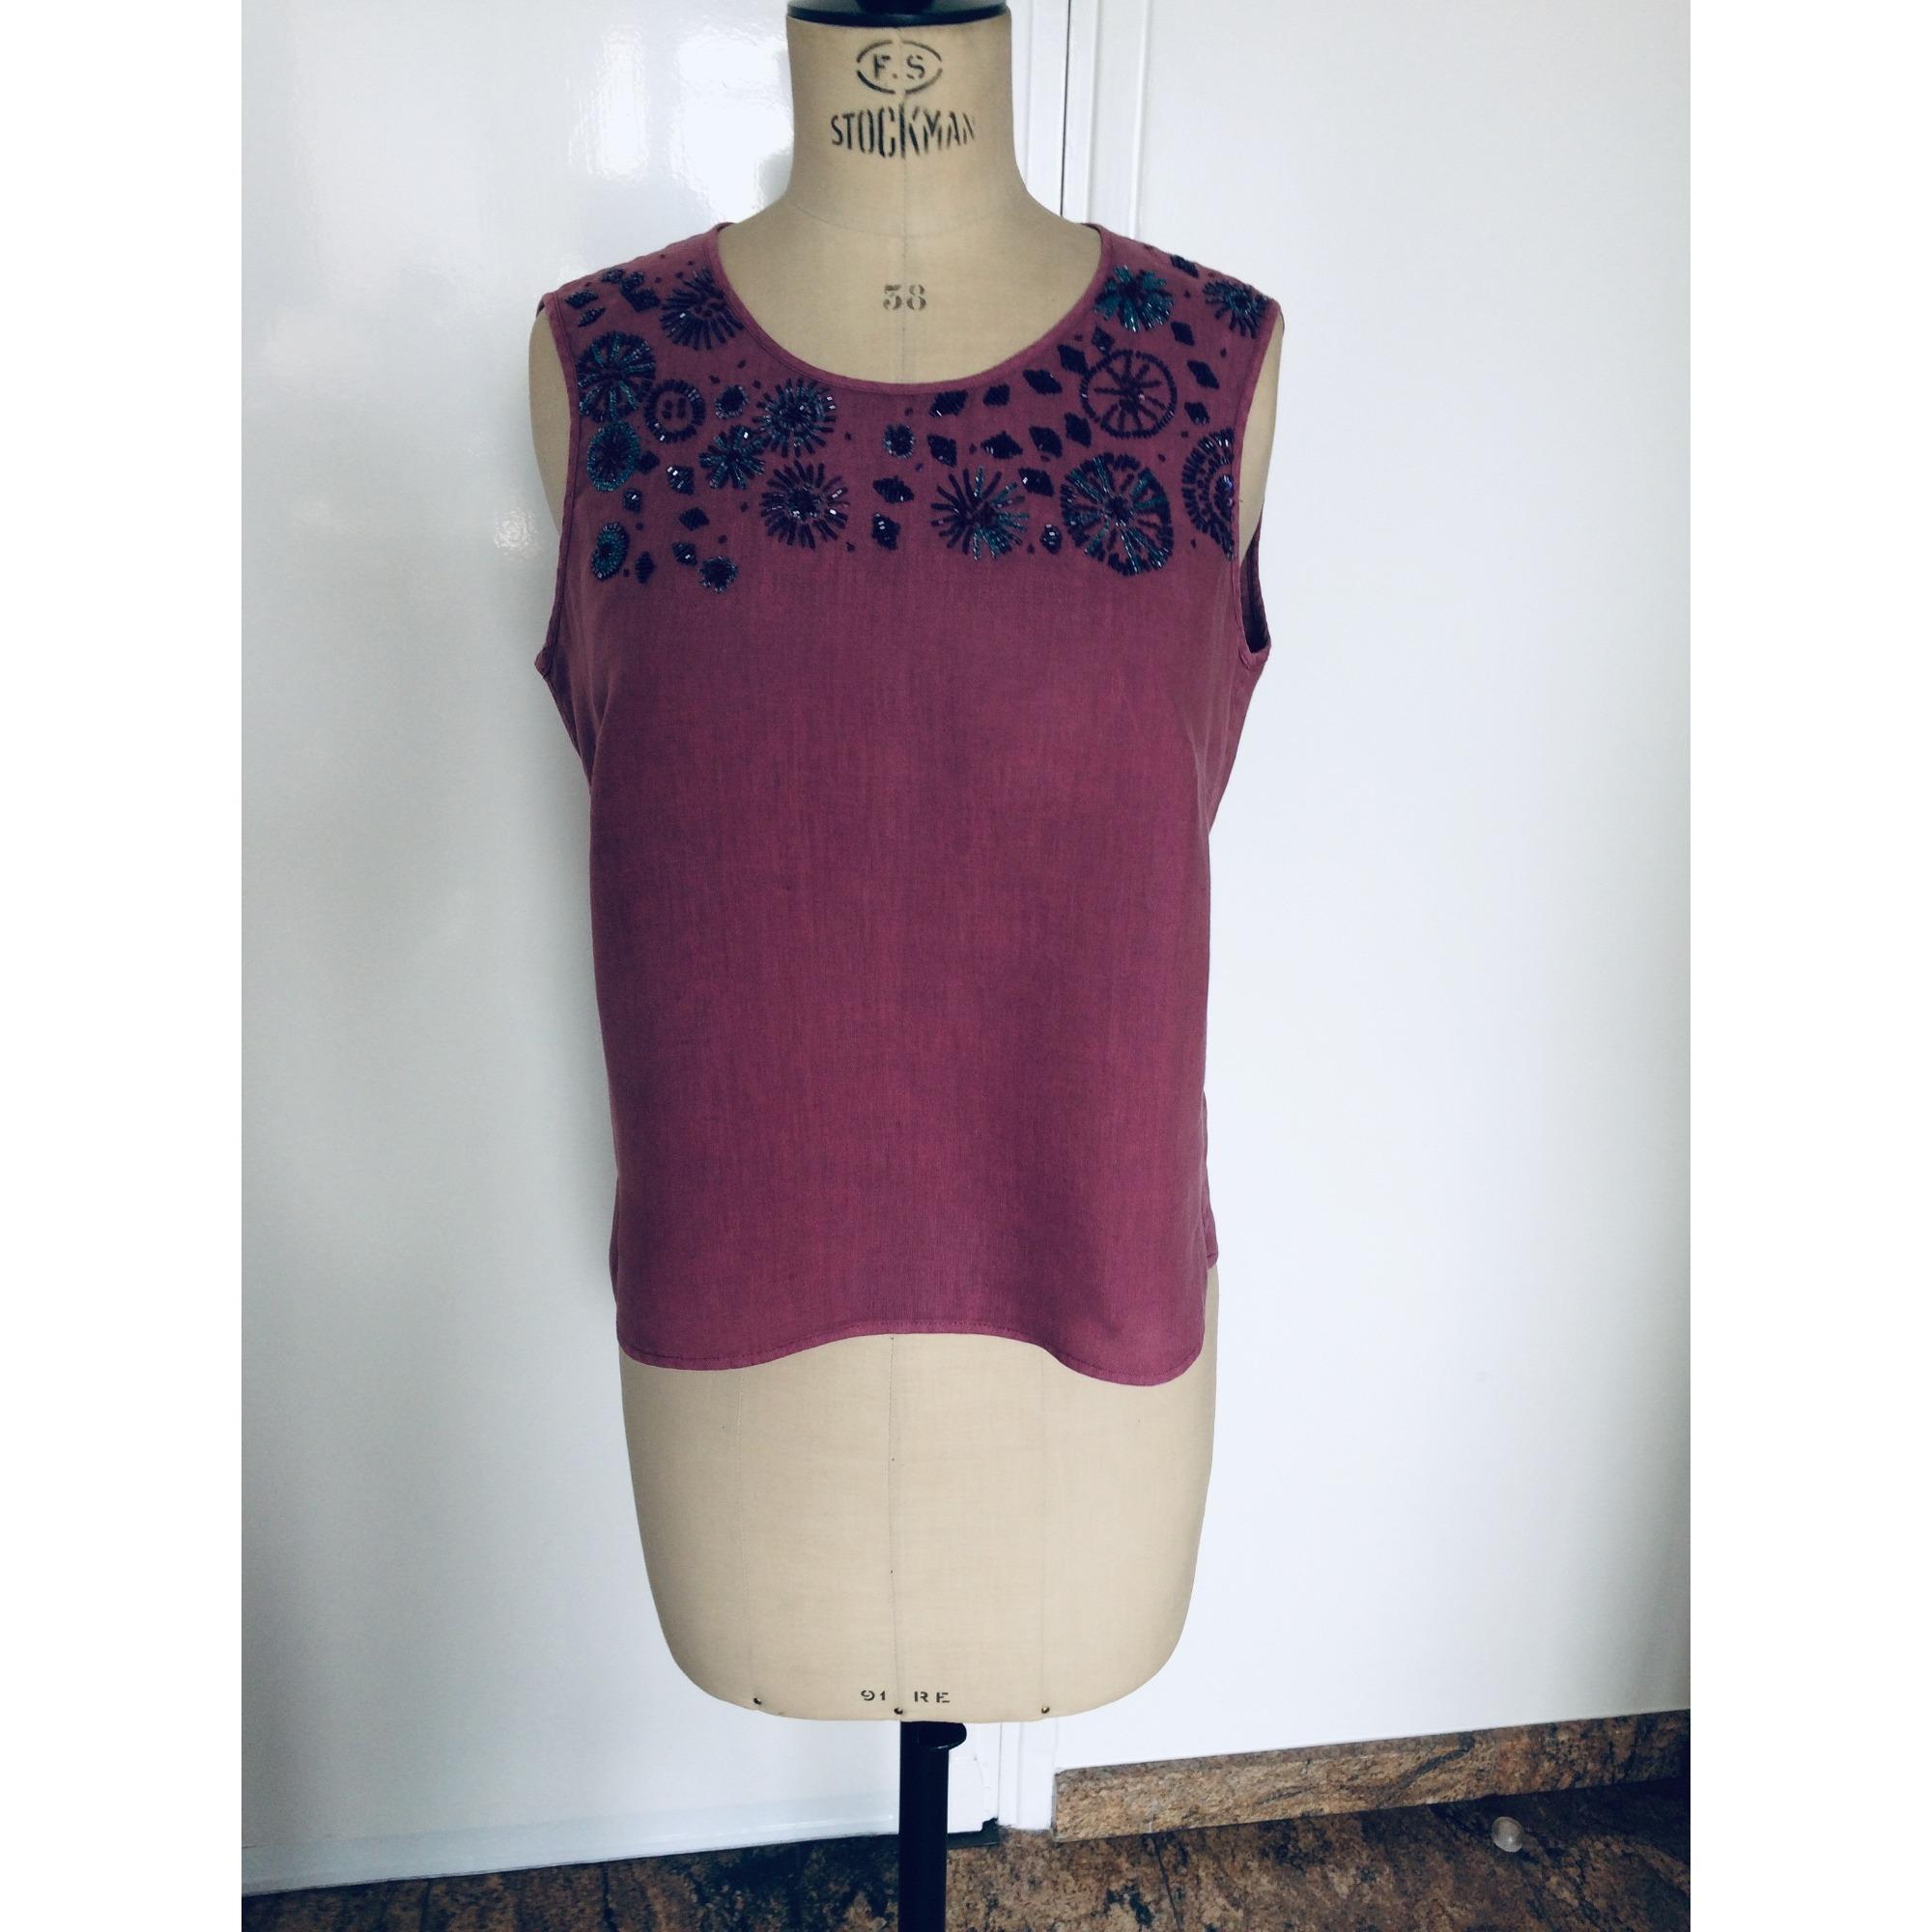 Top, tee-shirt ARMAND VENTILO Cassis / framboise